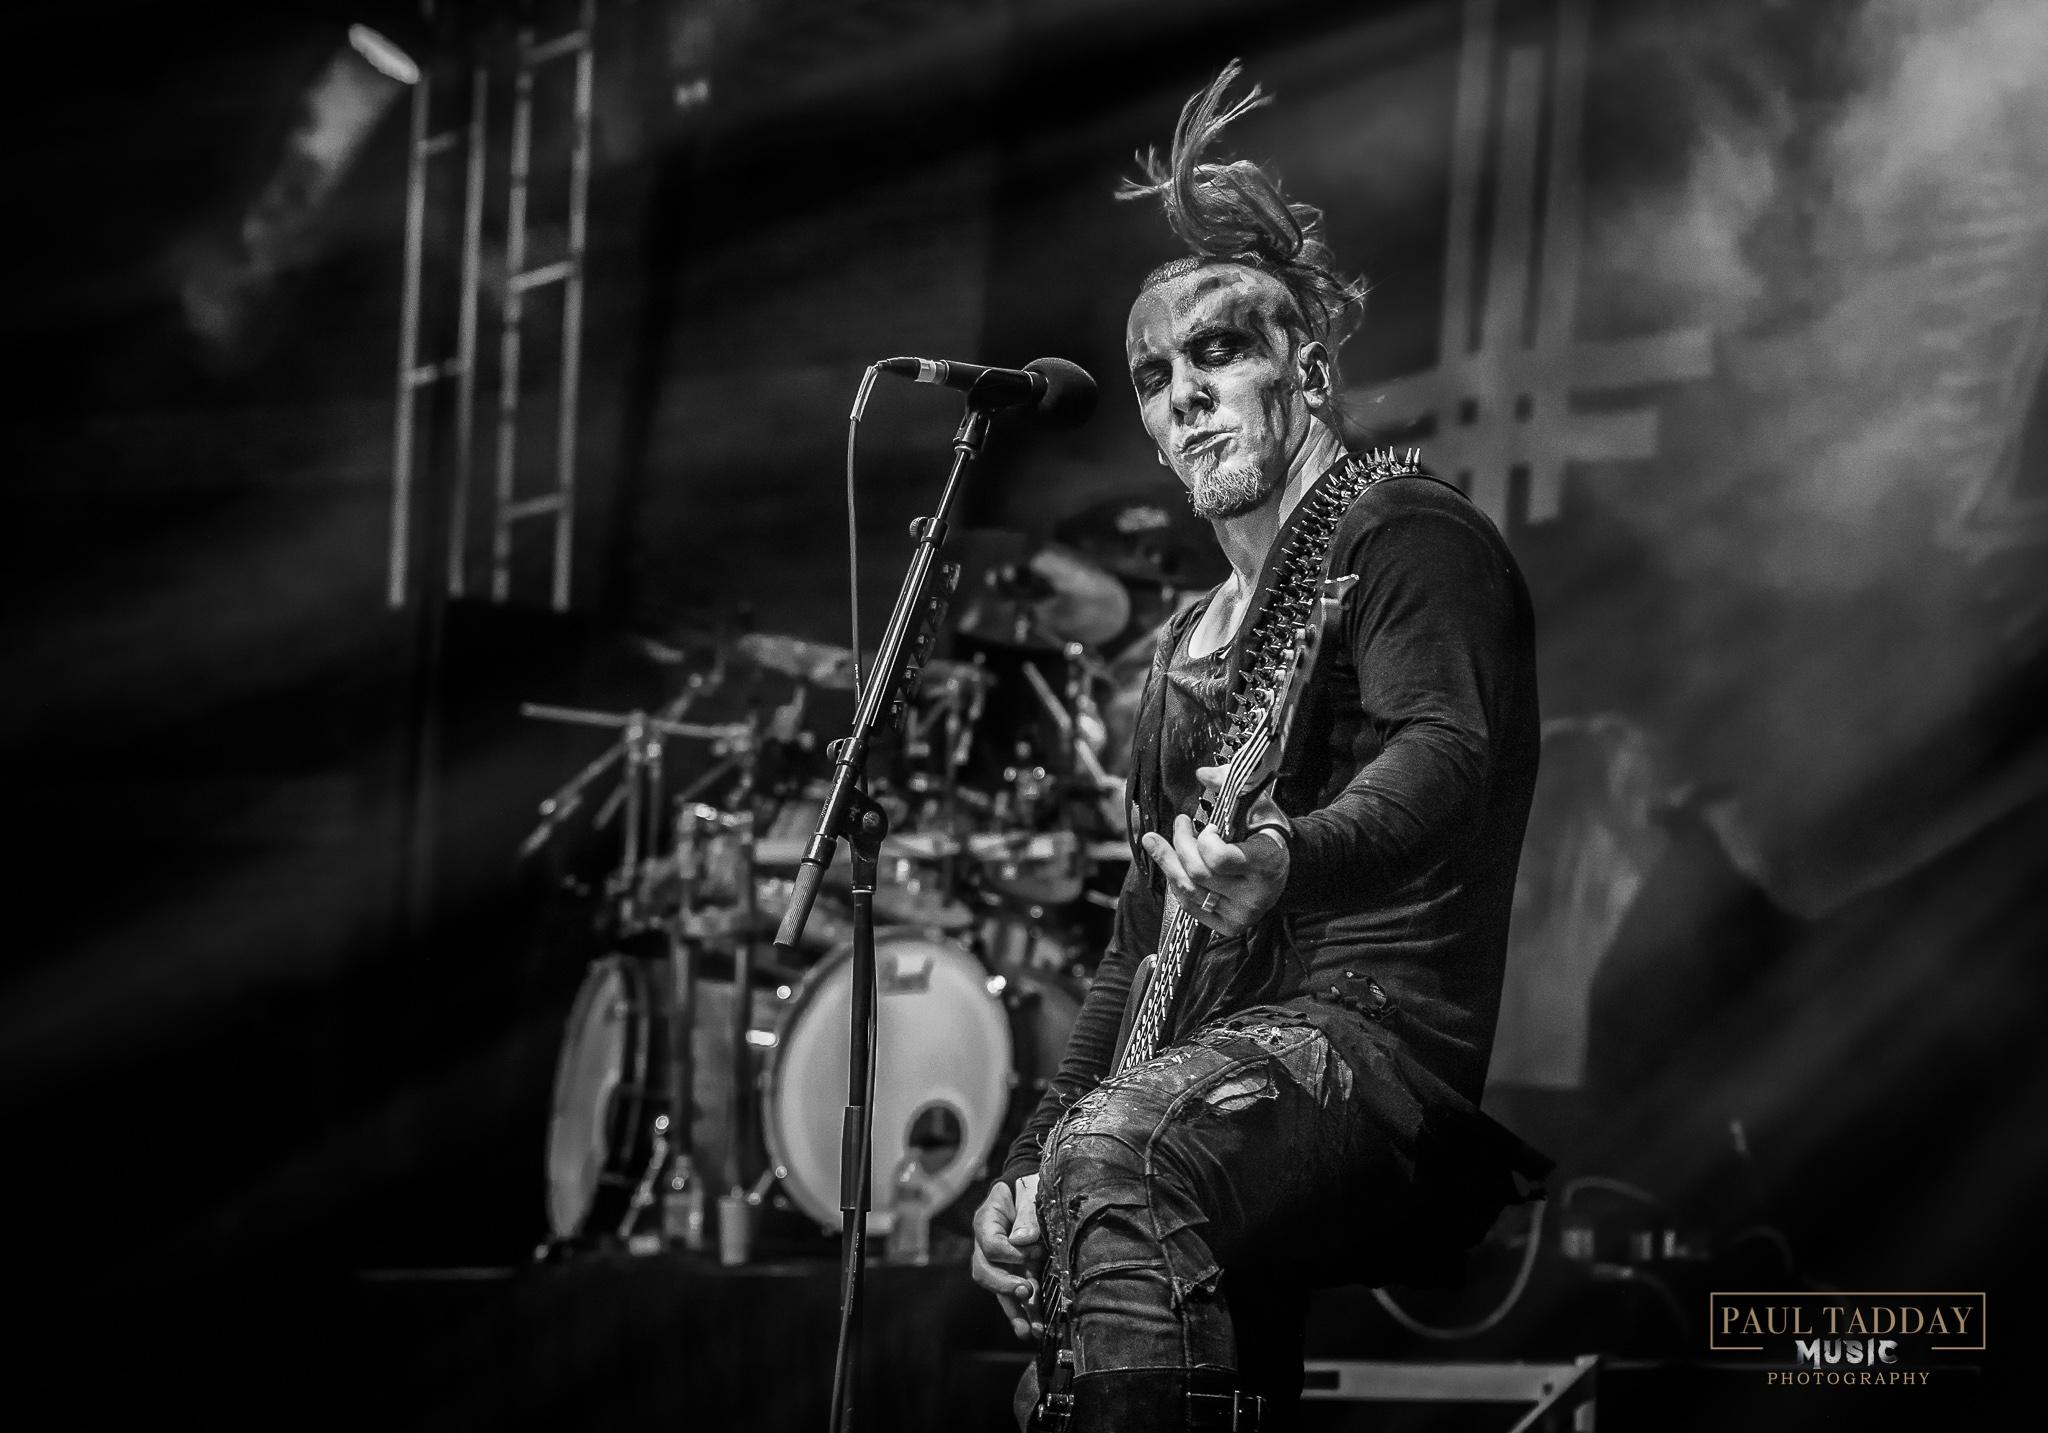 behemoth - brisbane - march 7 2019 - web - paul tadday photography - 12.jpg